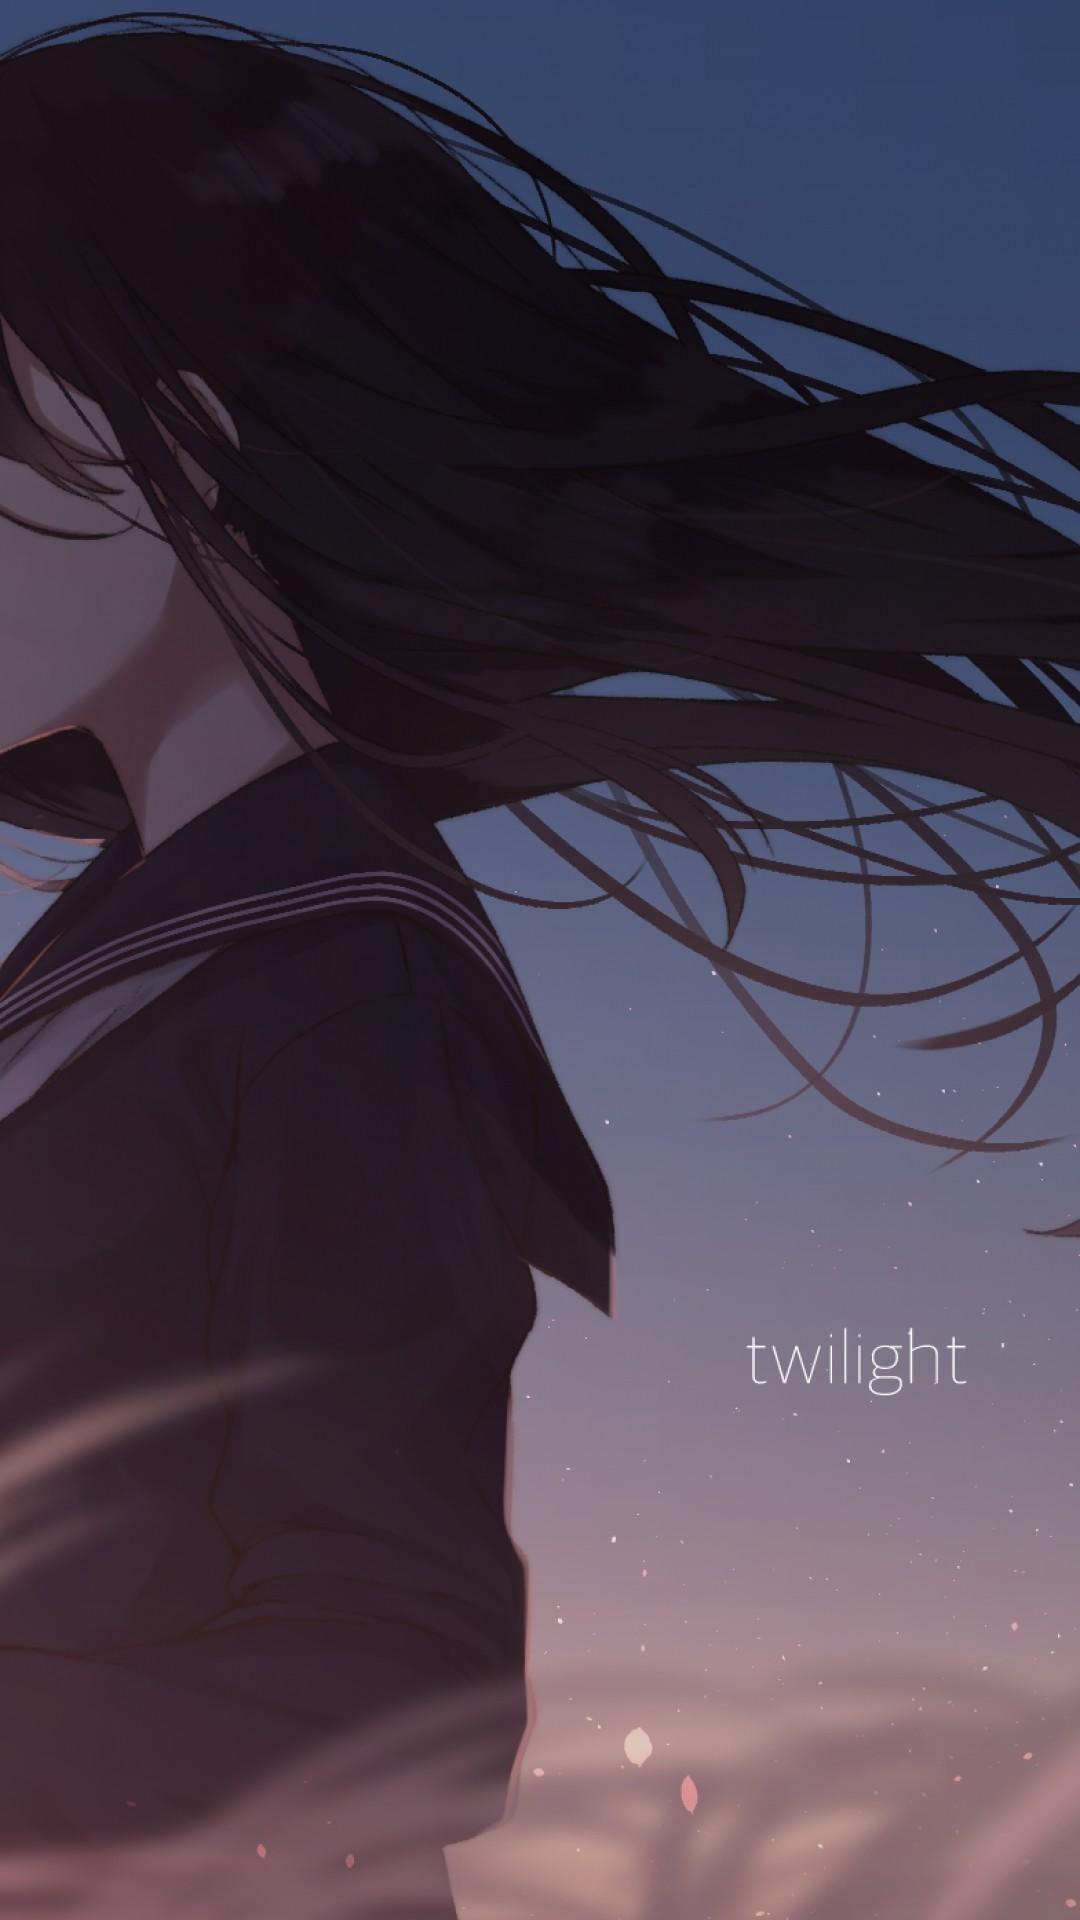 Res: 1080x1920, Best of Sad Anime iPhone Wallpapers Free - Anime Girl Sad School Uniform  Windy Black Hair